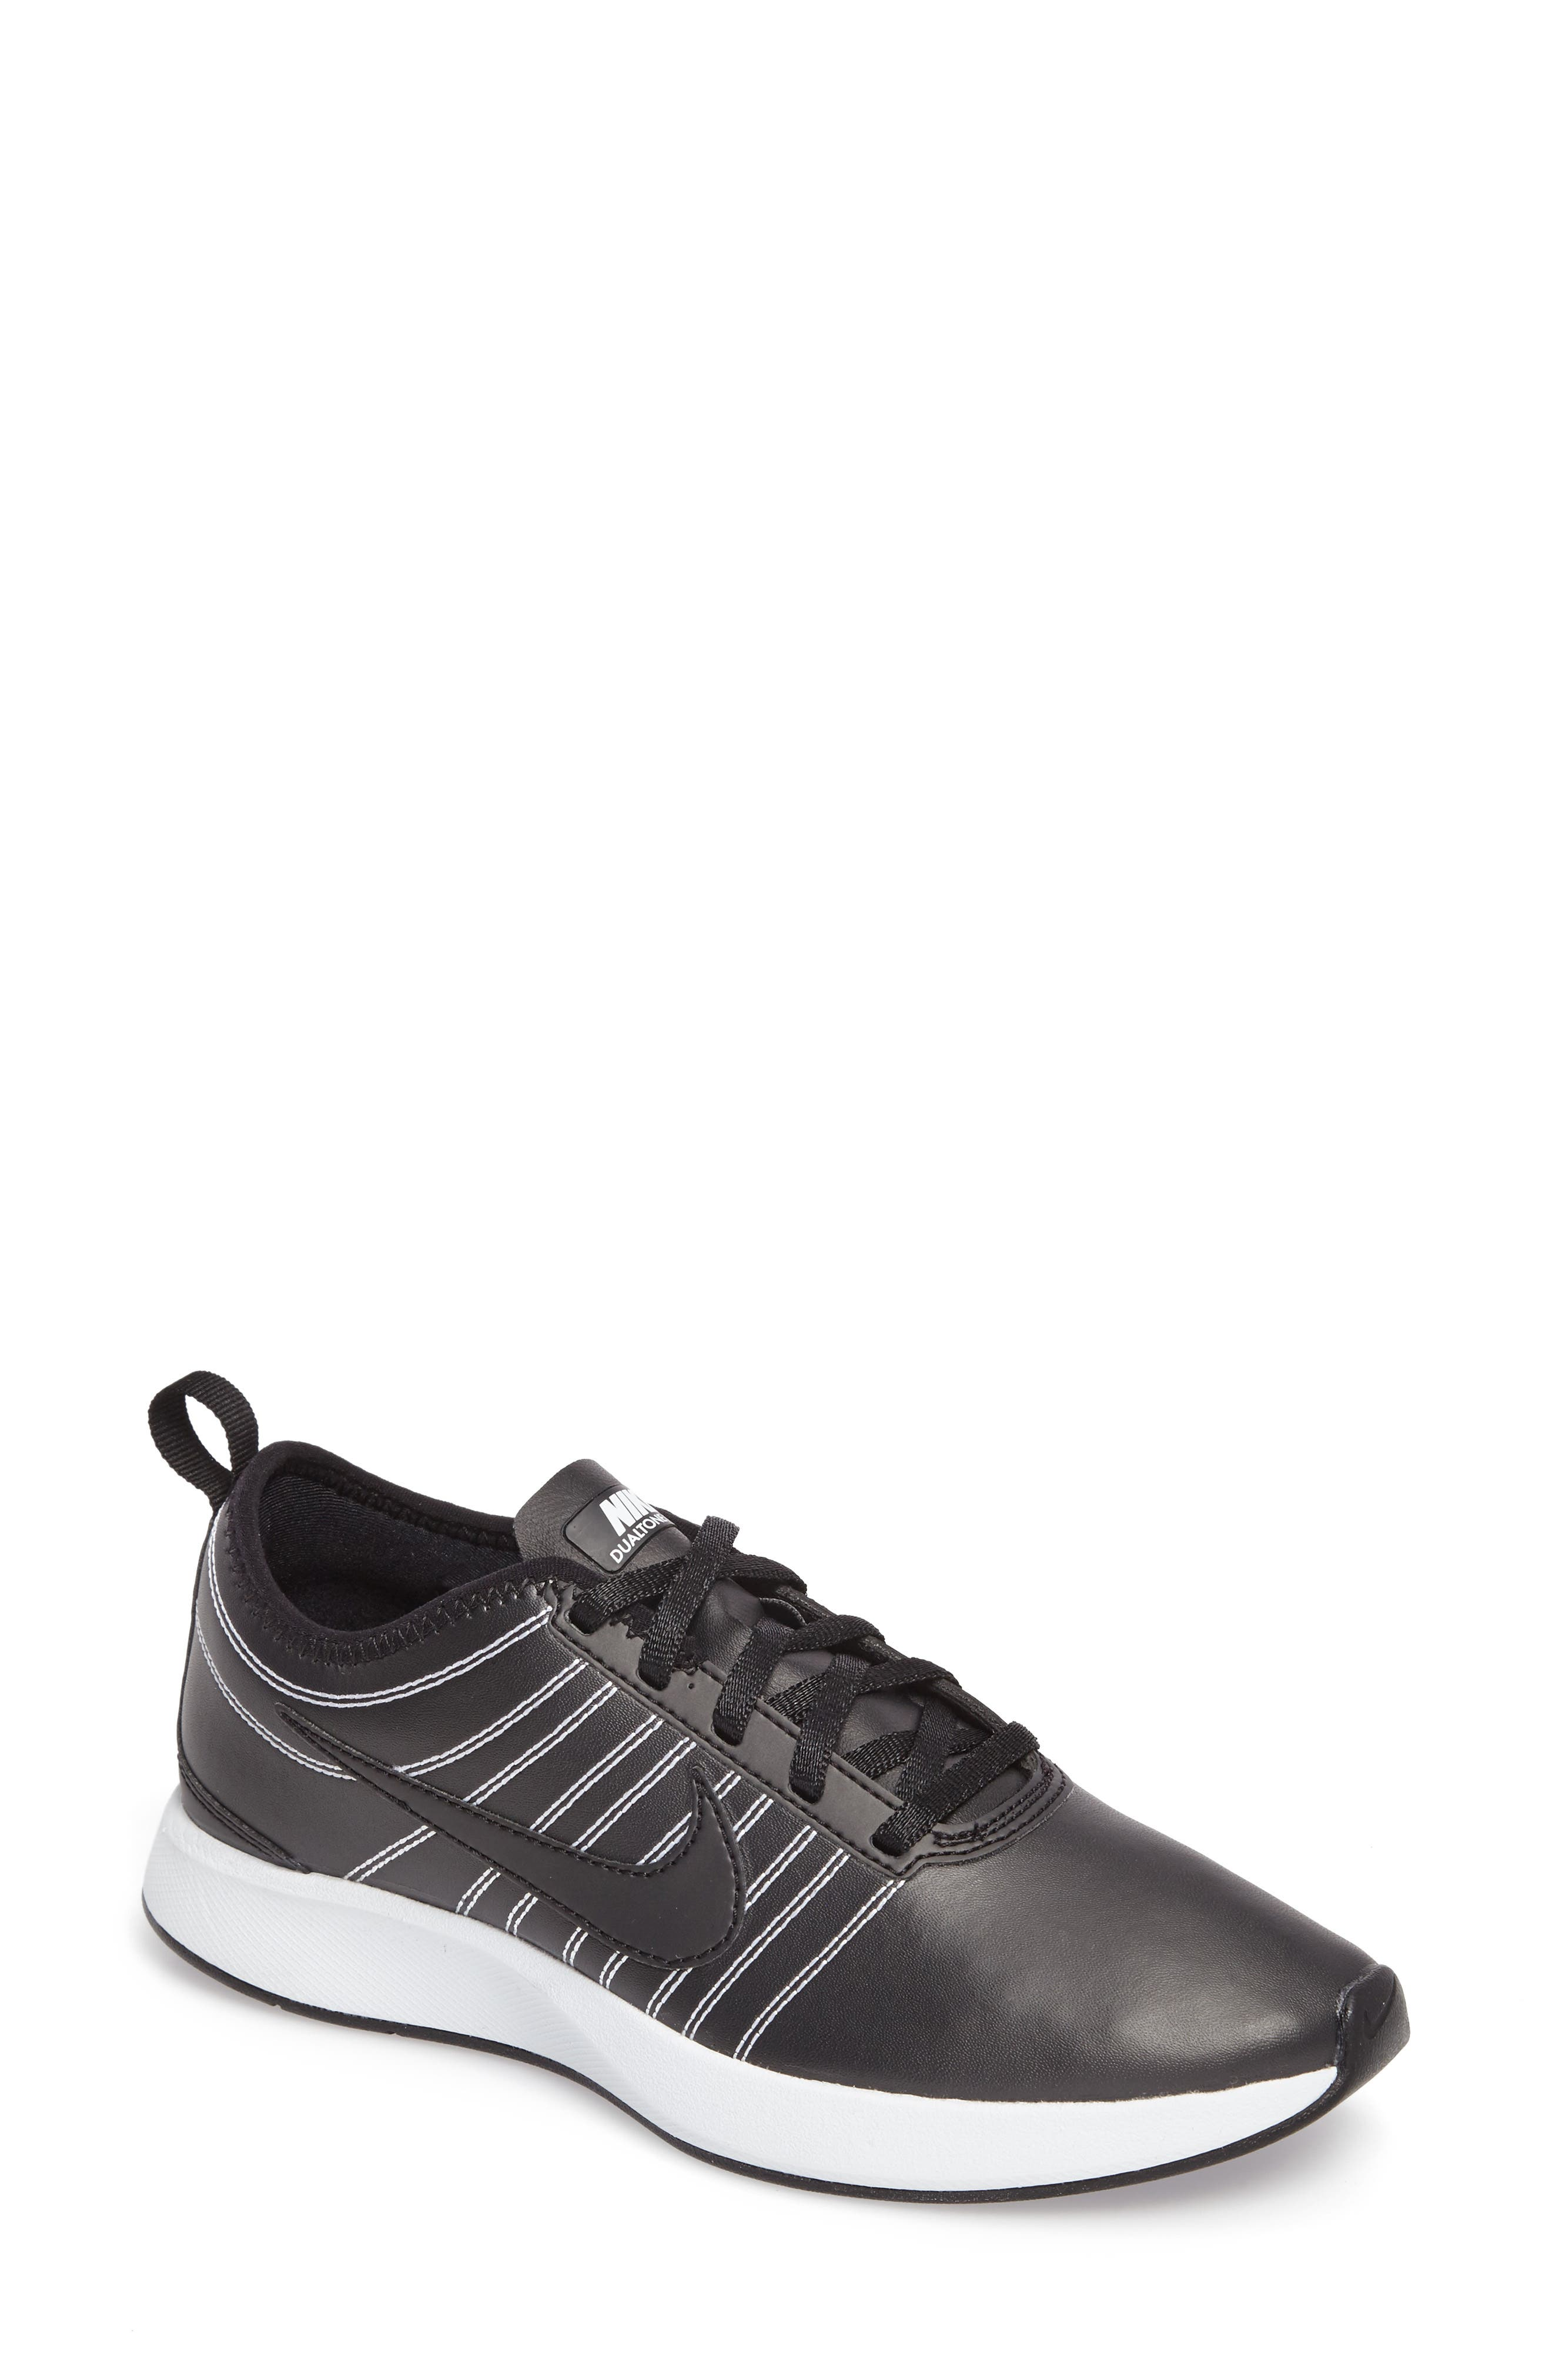 Dualtone Racer PRM Sneaker,                             Main thumbnail 3, color,